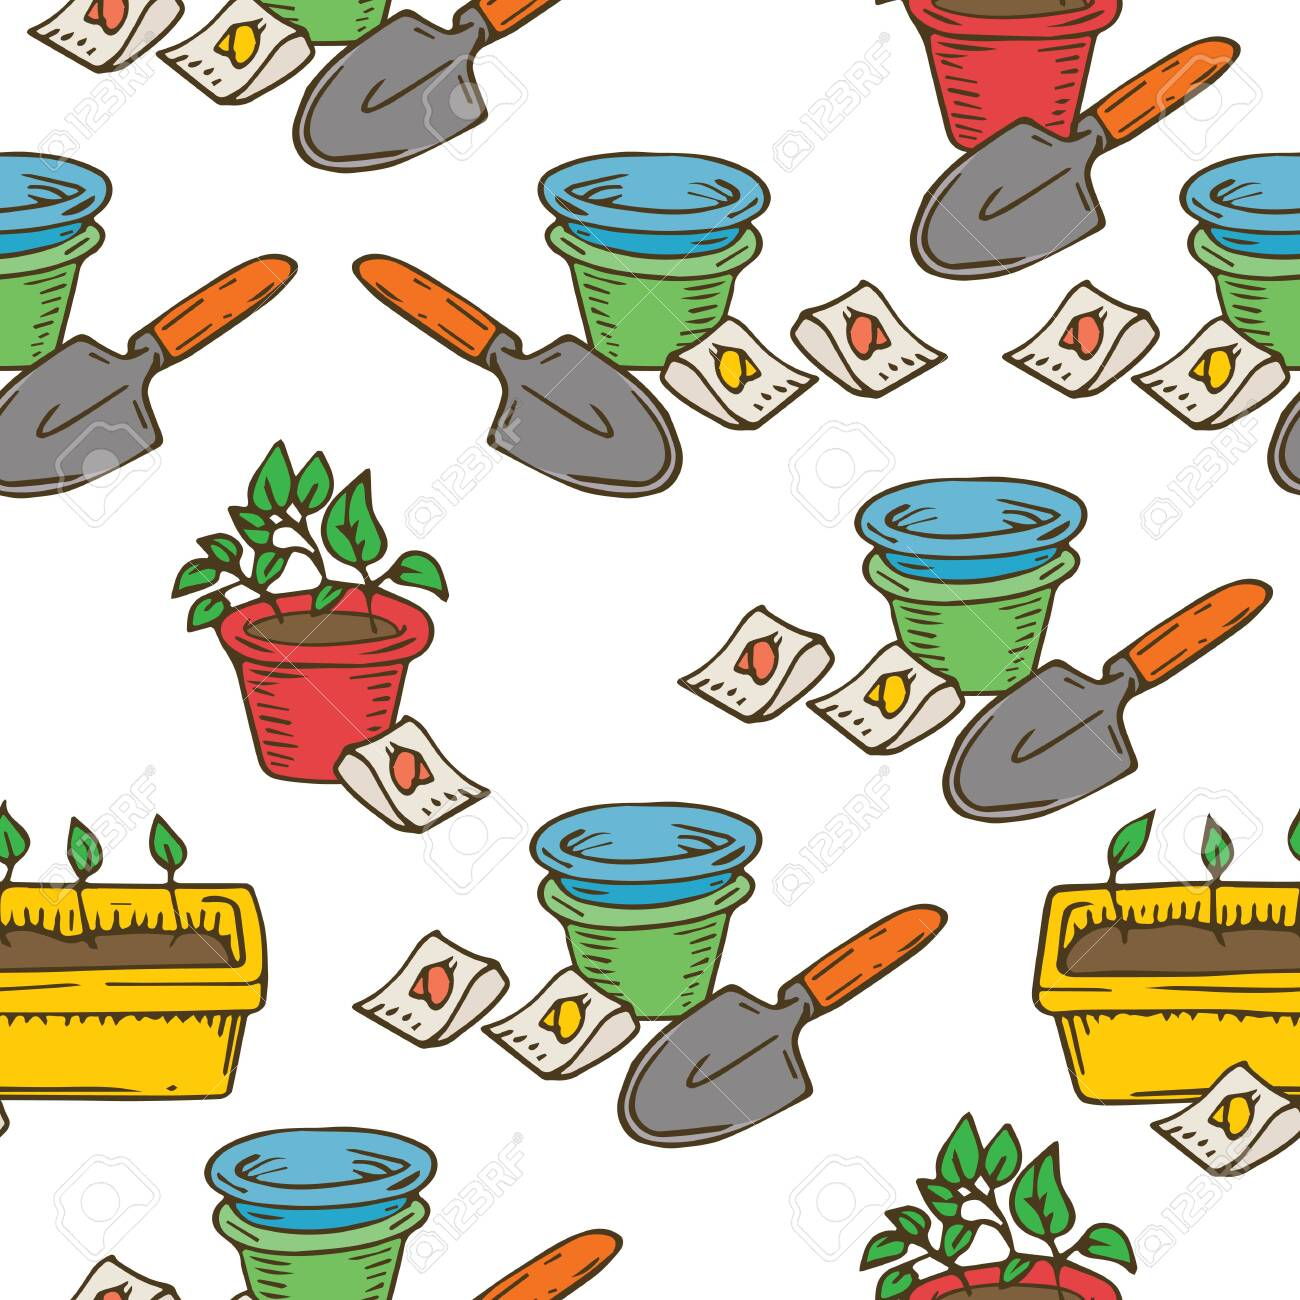 Potting Flower Seamless Pattern. Vector Illustration on White Background - 123709090